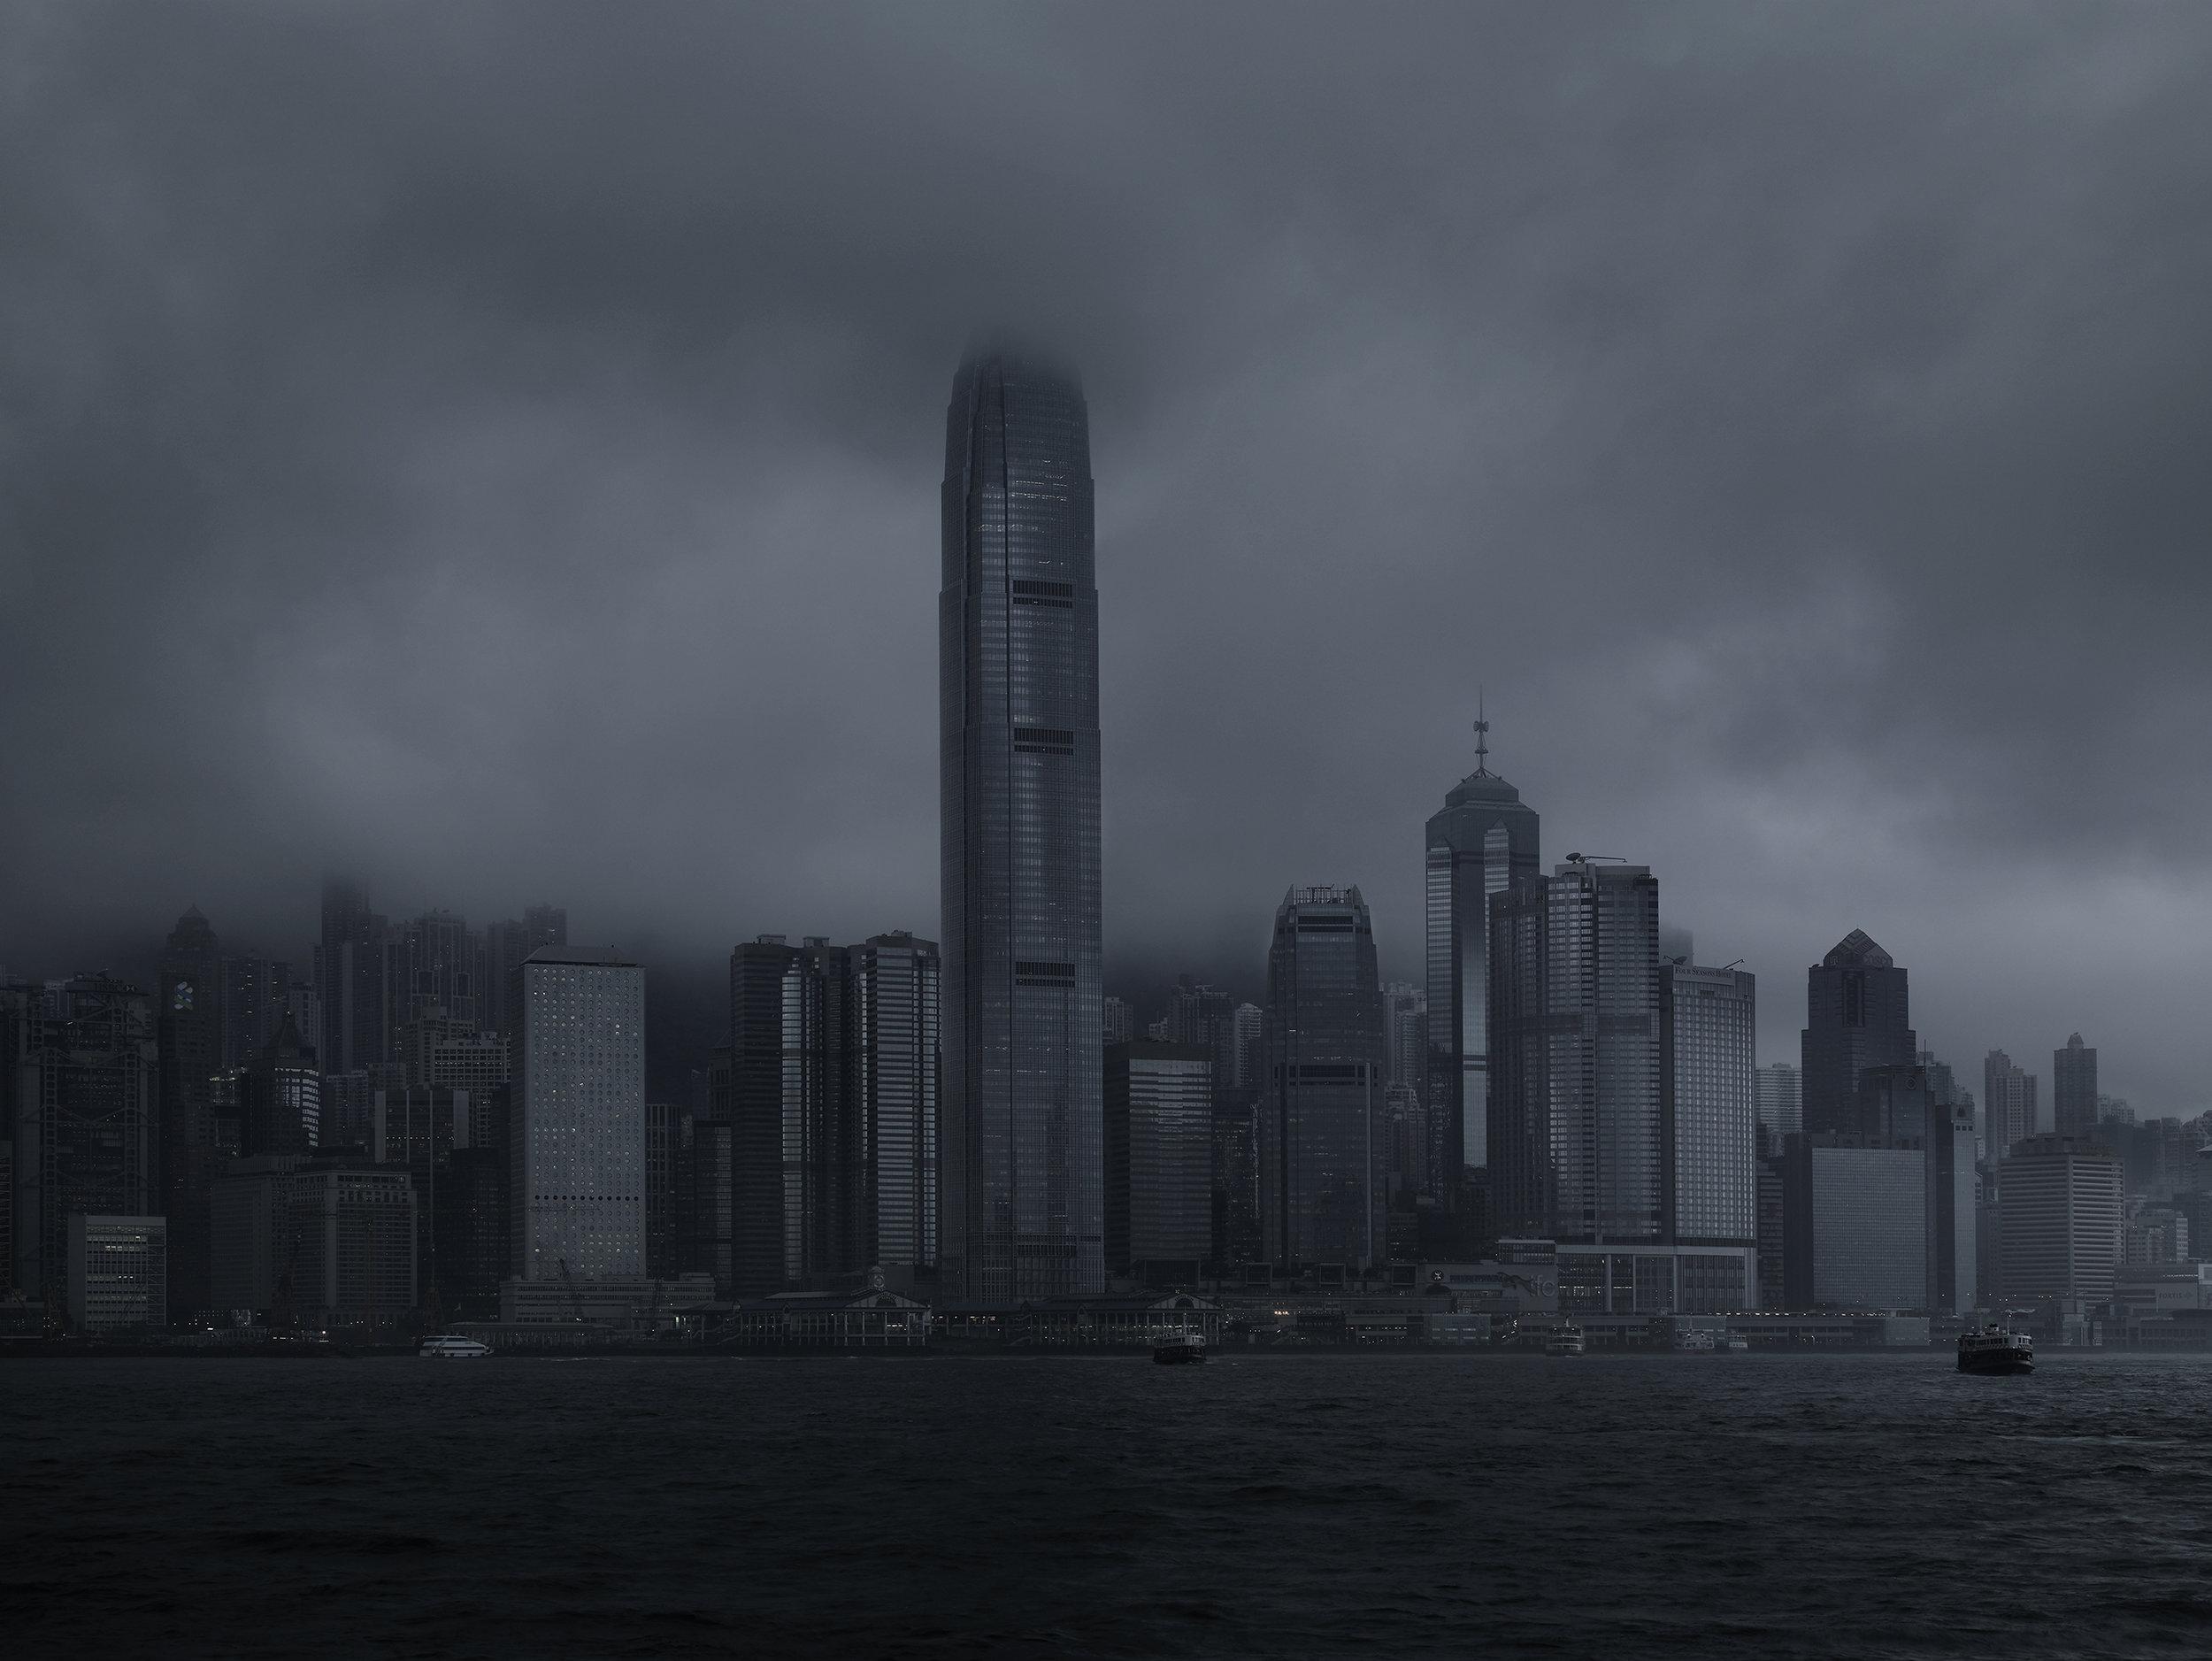 Buisness quarter 4, Hong-Kong, China, 2008.